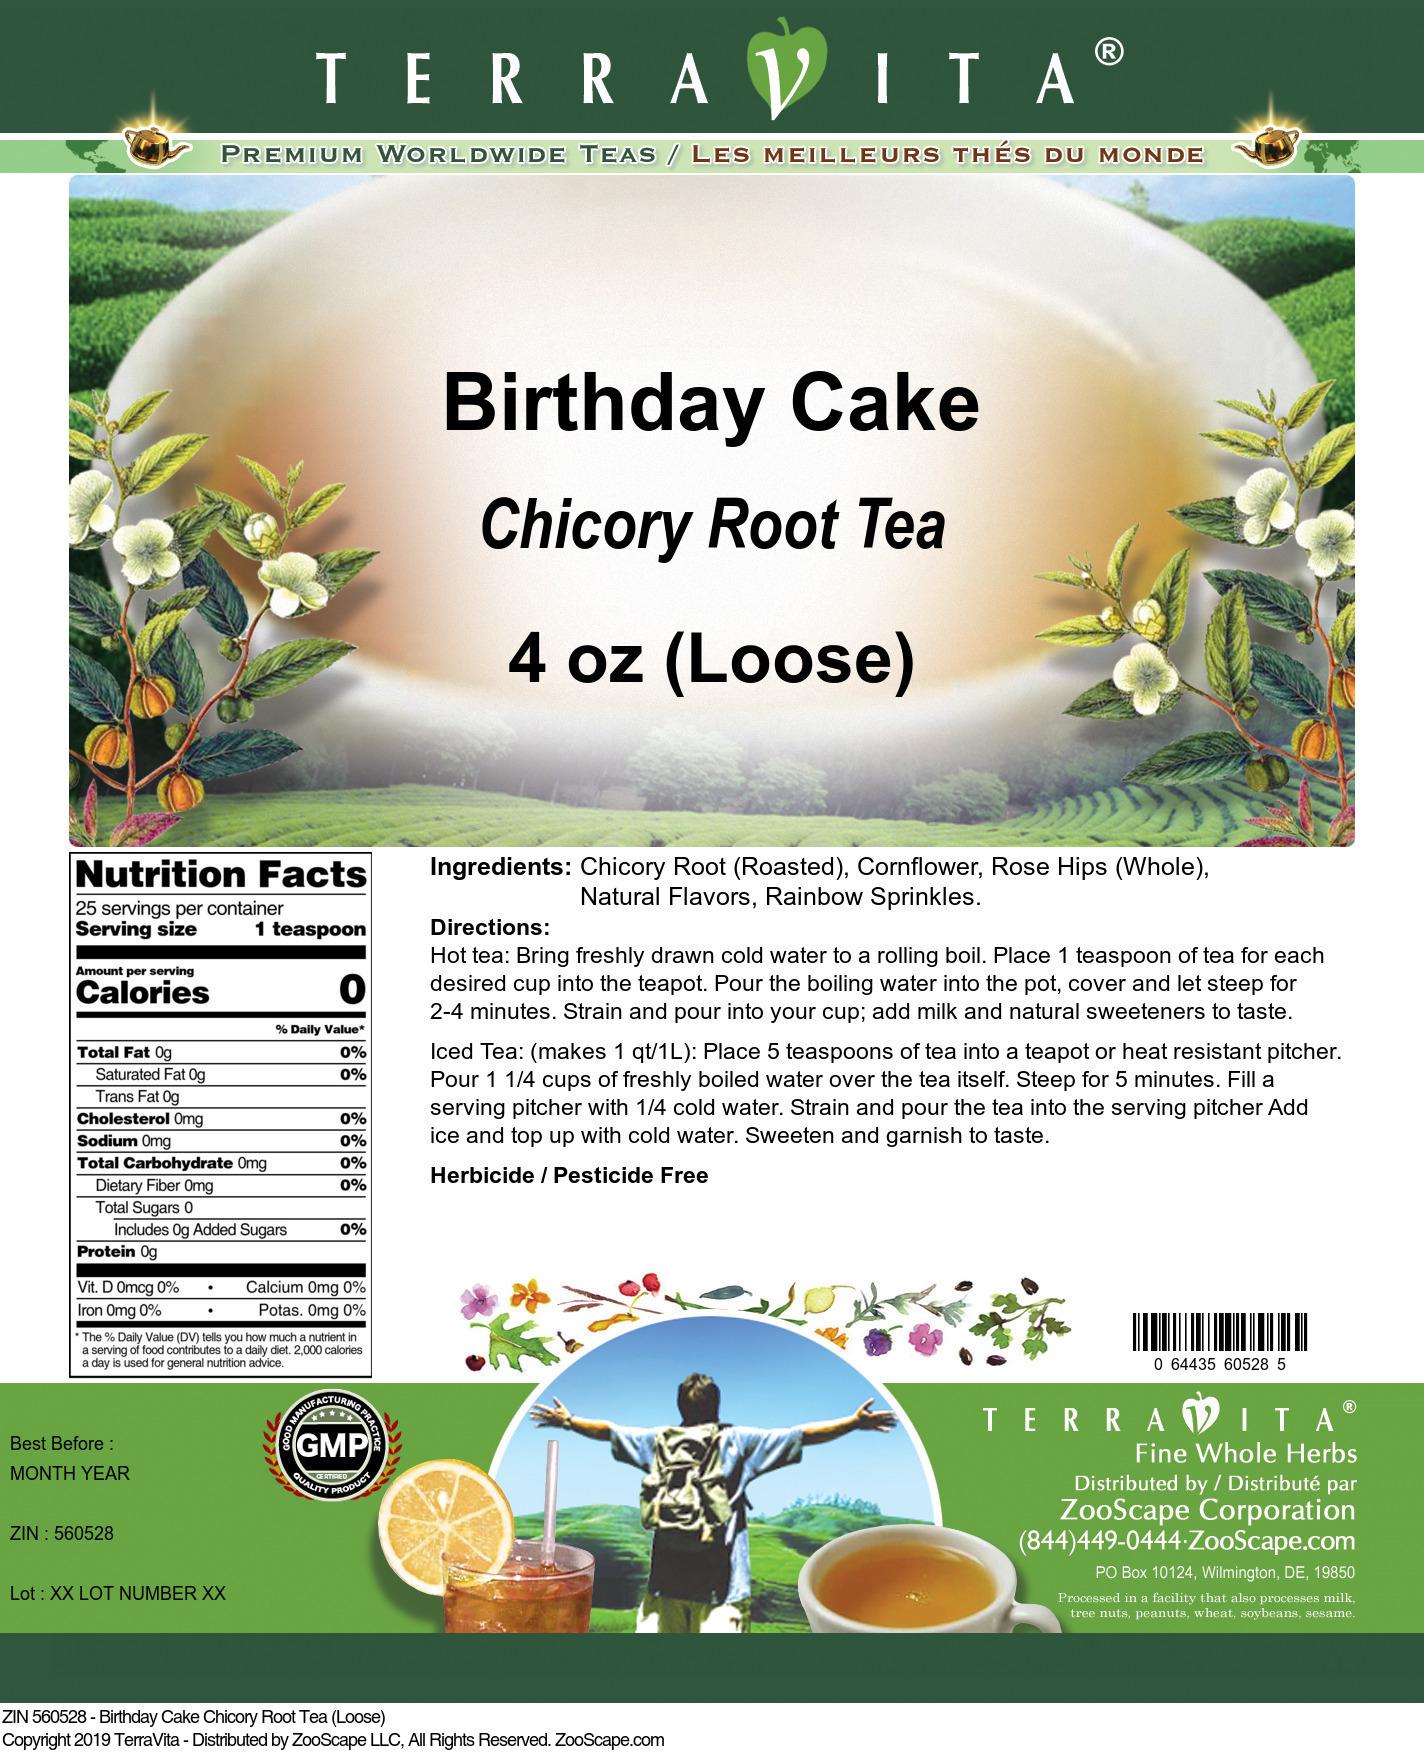 Birthday Cake Chicory Root Tea (Loose)